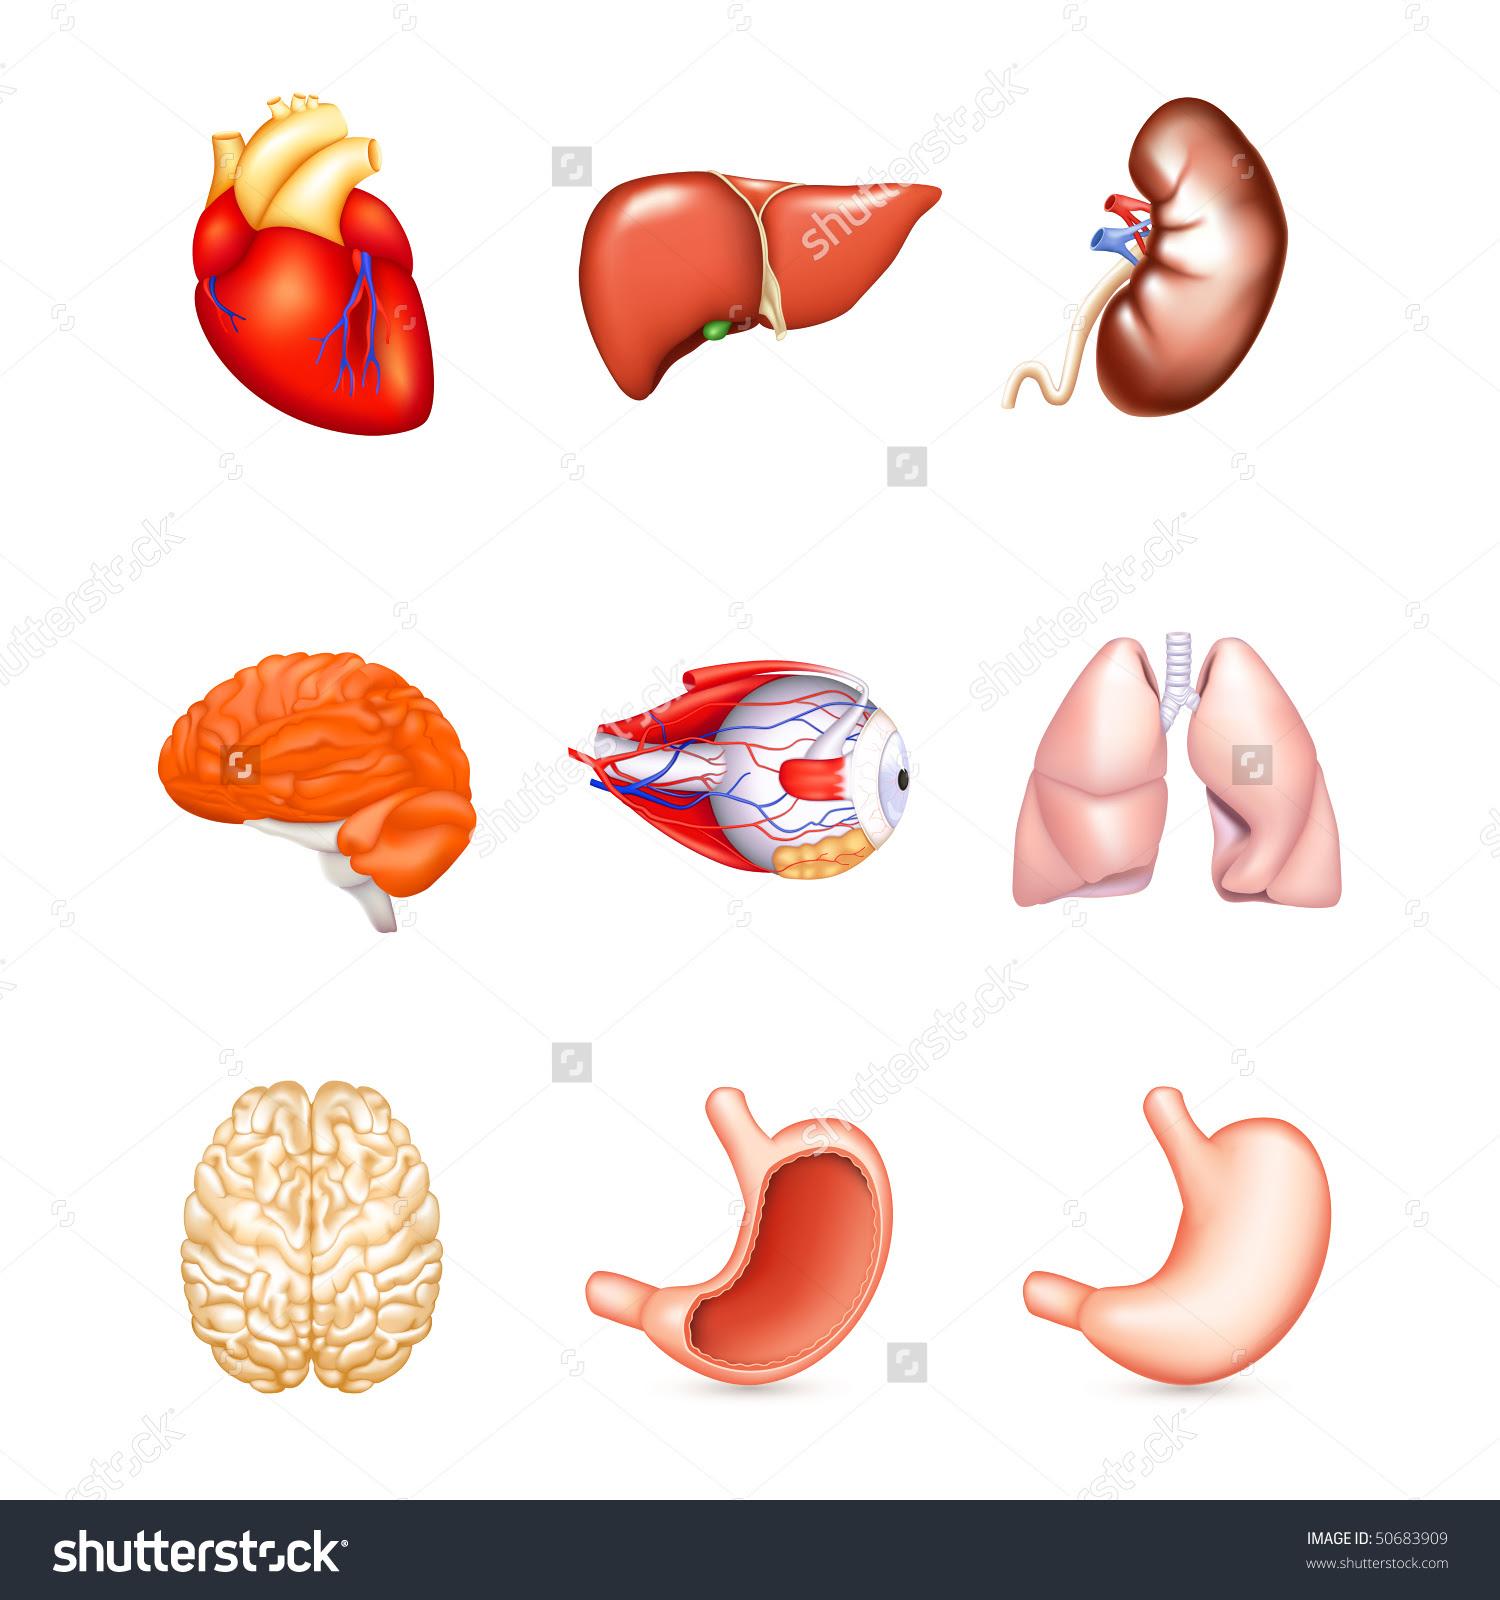 Human Internal Organ Clipart 20 Free Cliparts Download